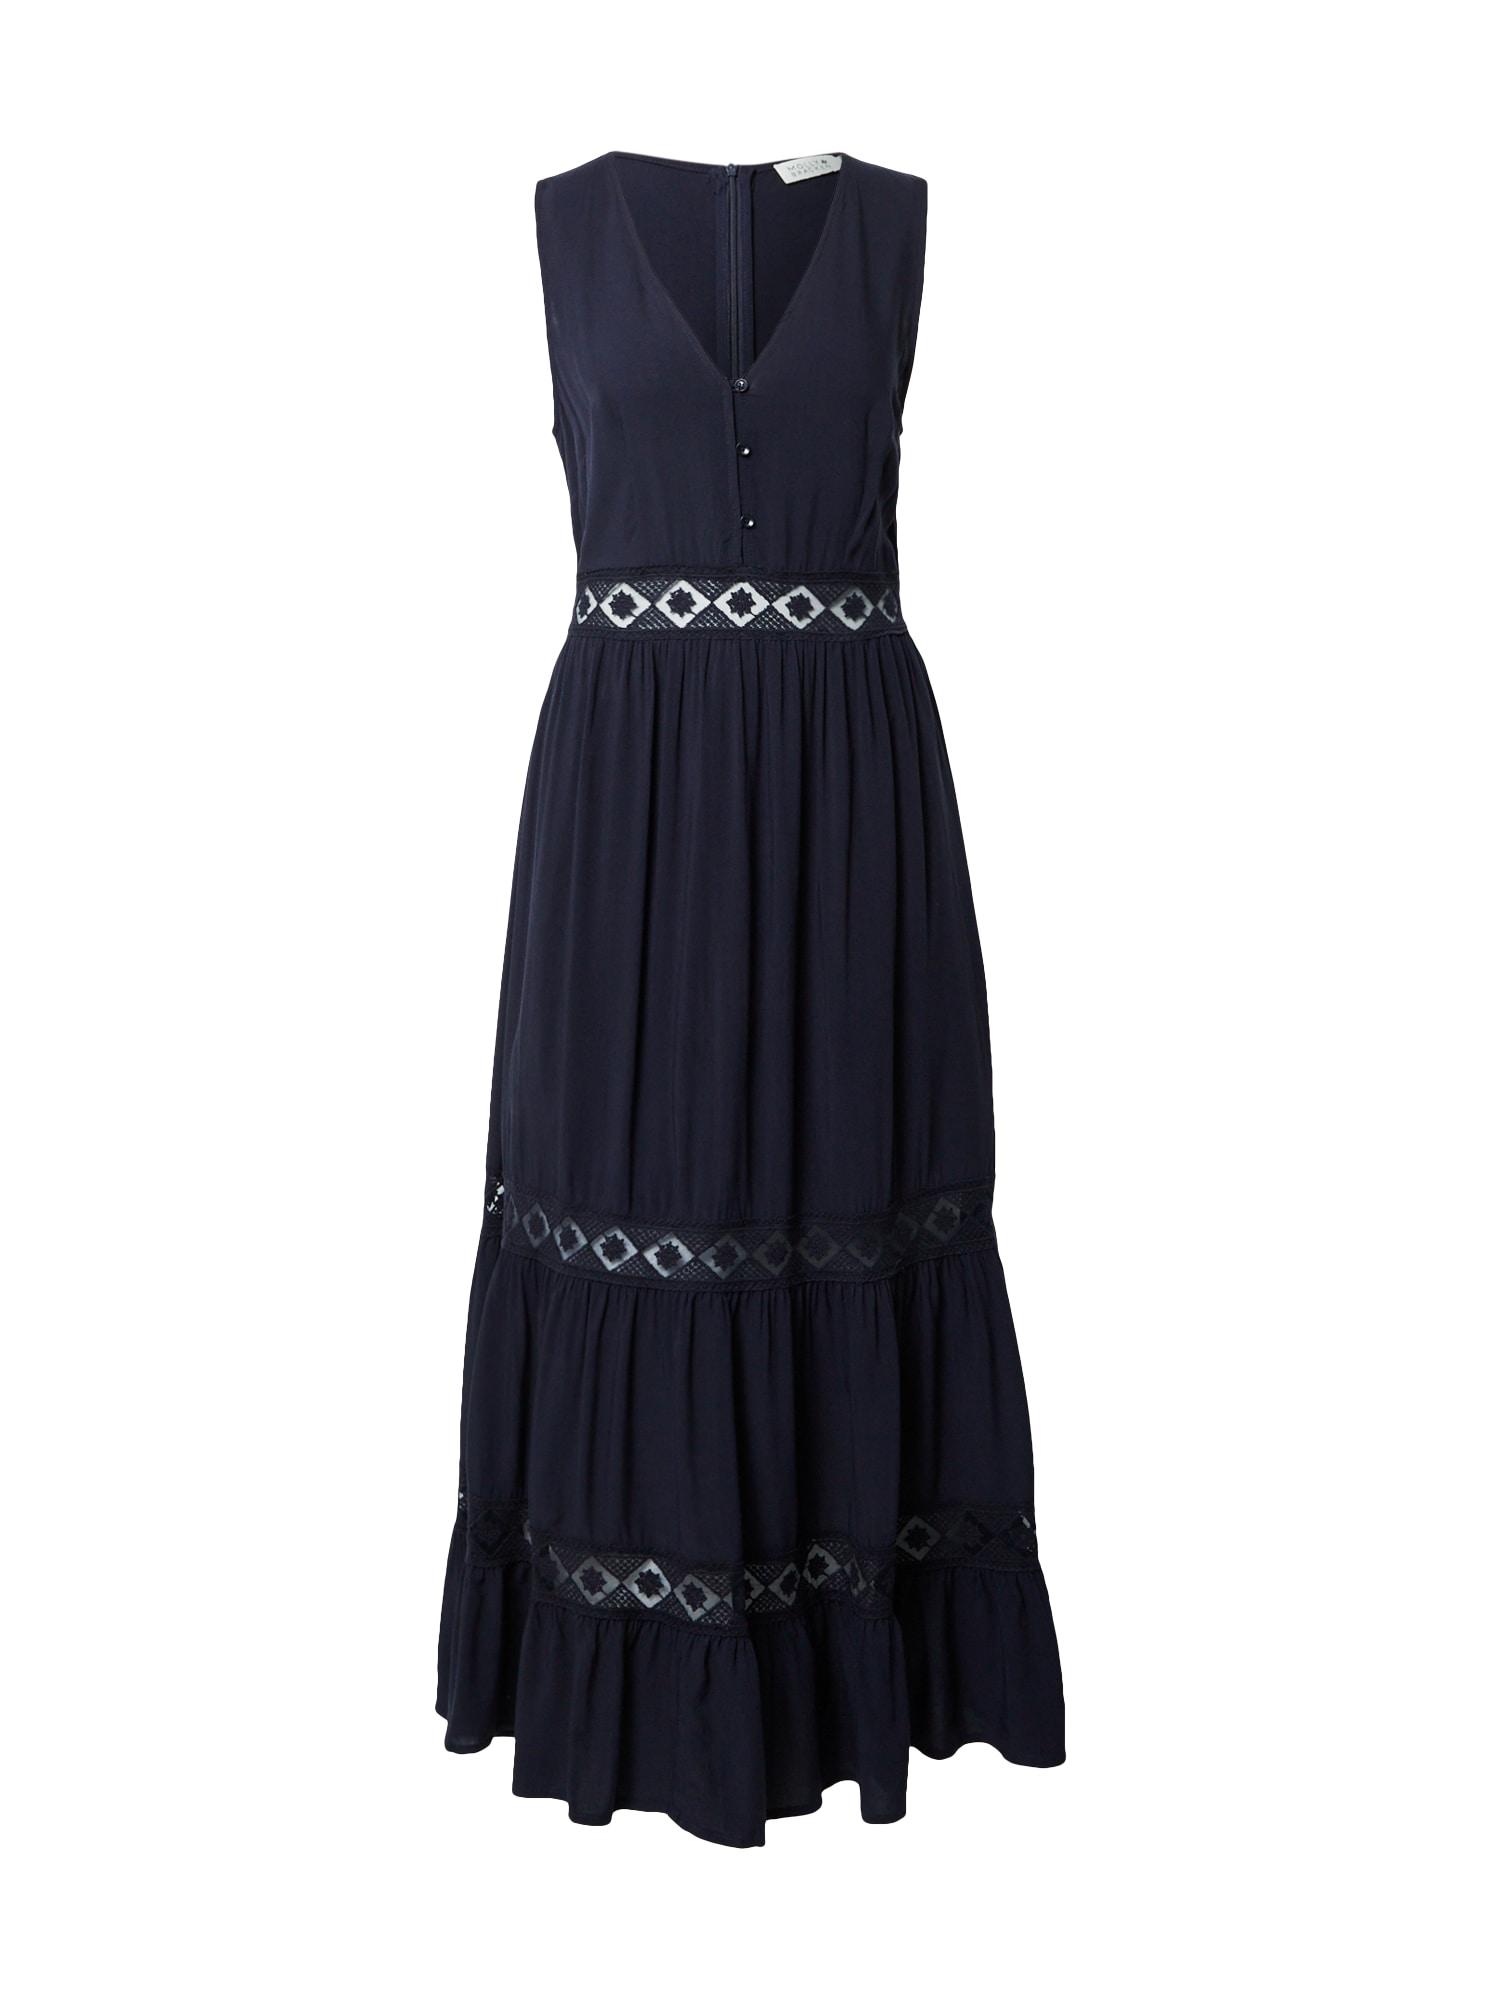 Molly BRACKEN Suknelė nakties mėlyna